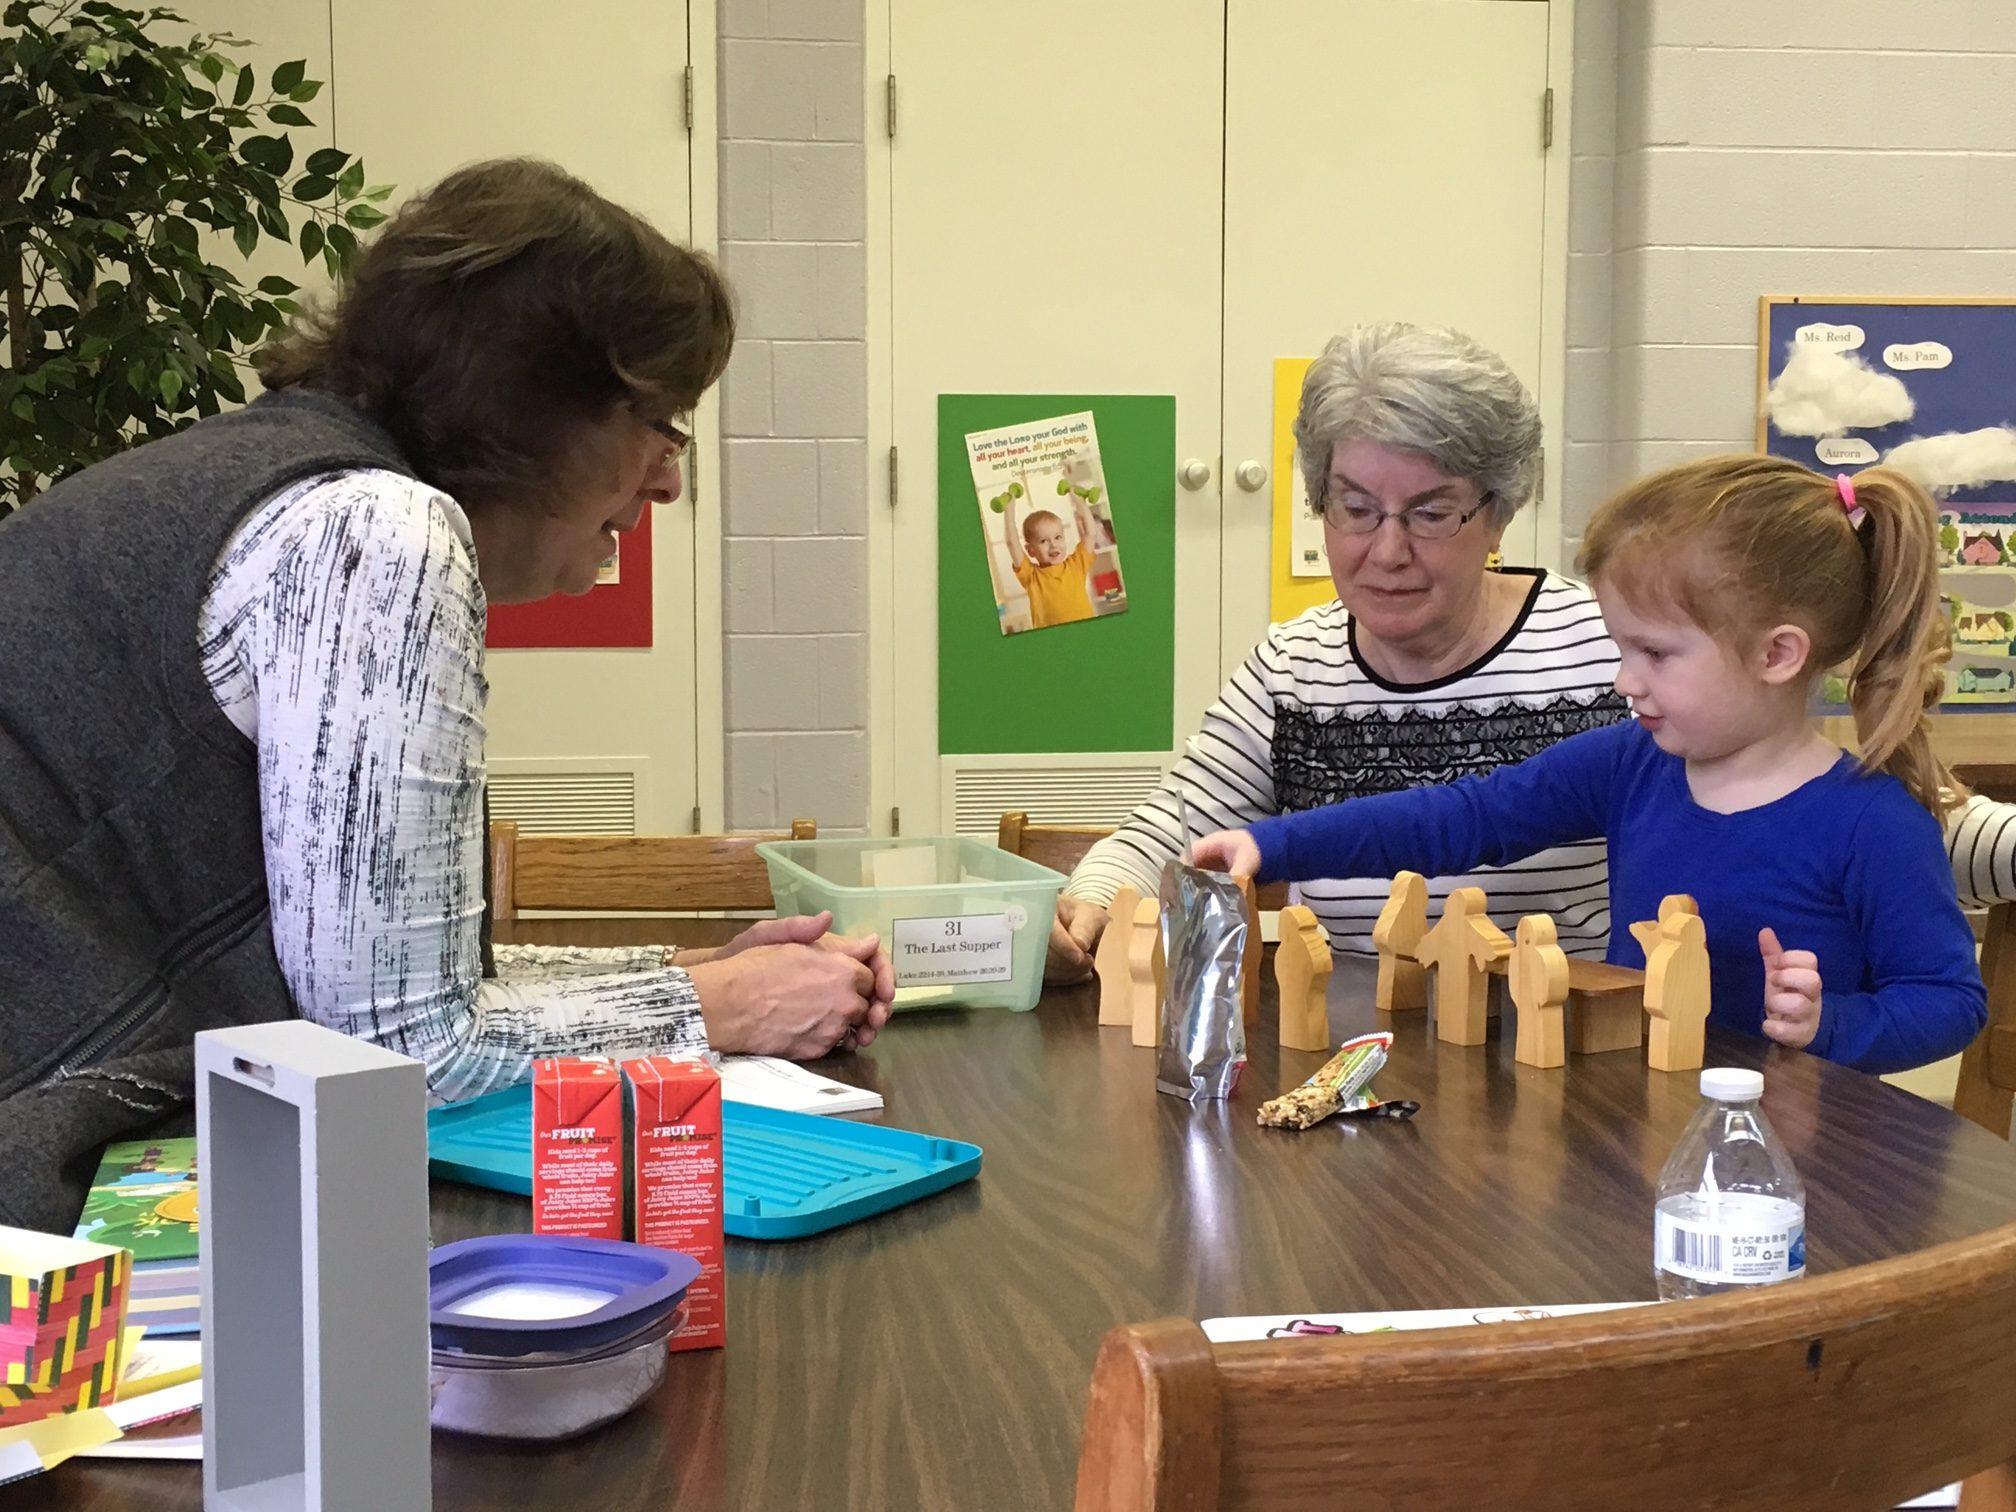 Asbury Children's Ministries – Asbury United Methodist Church